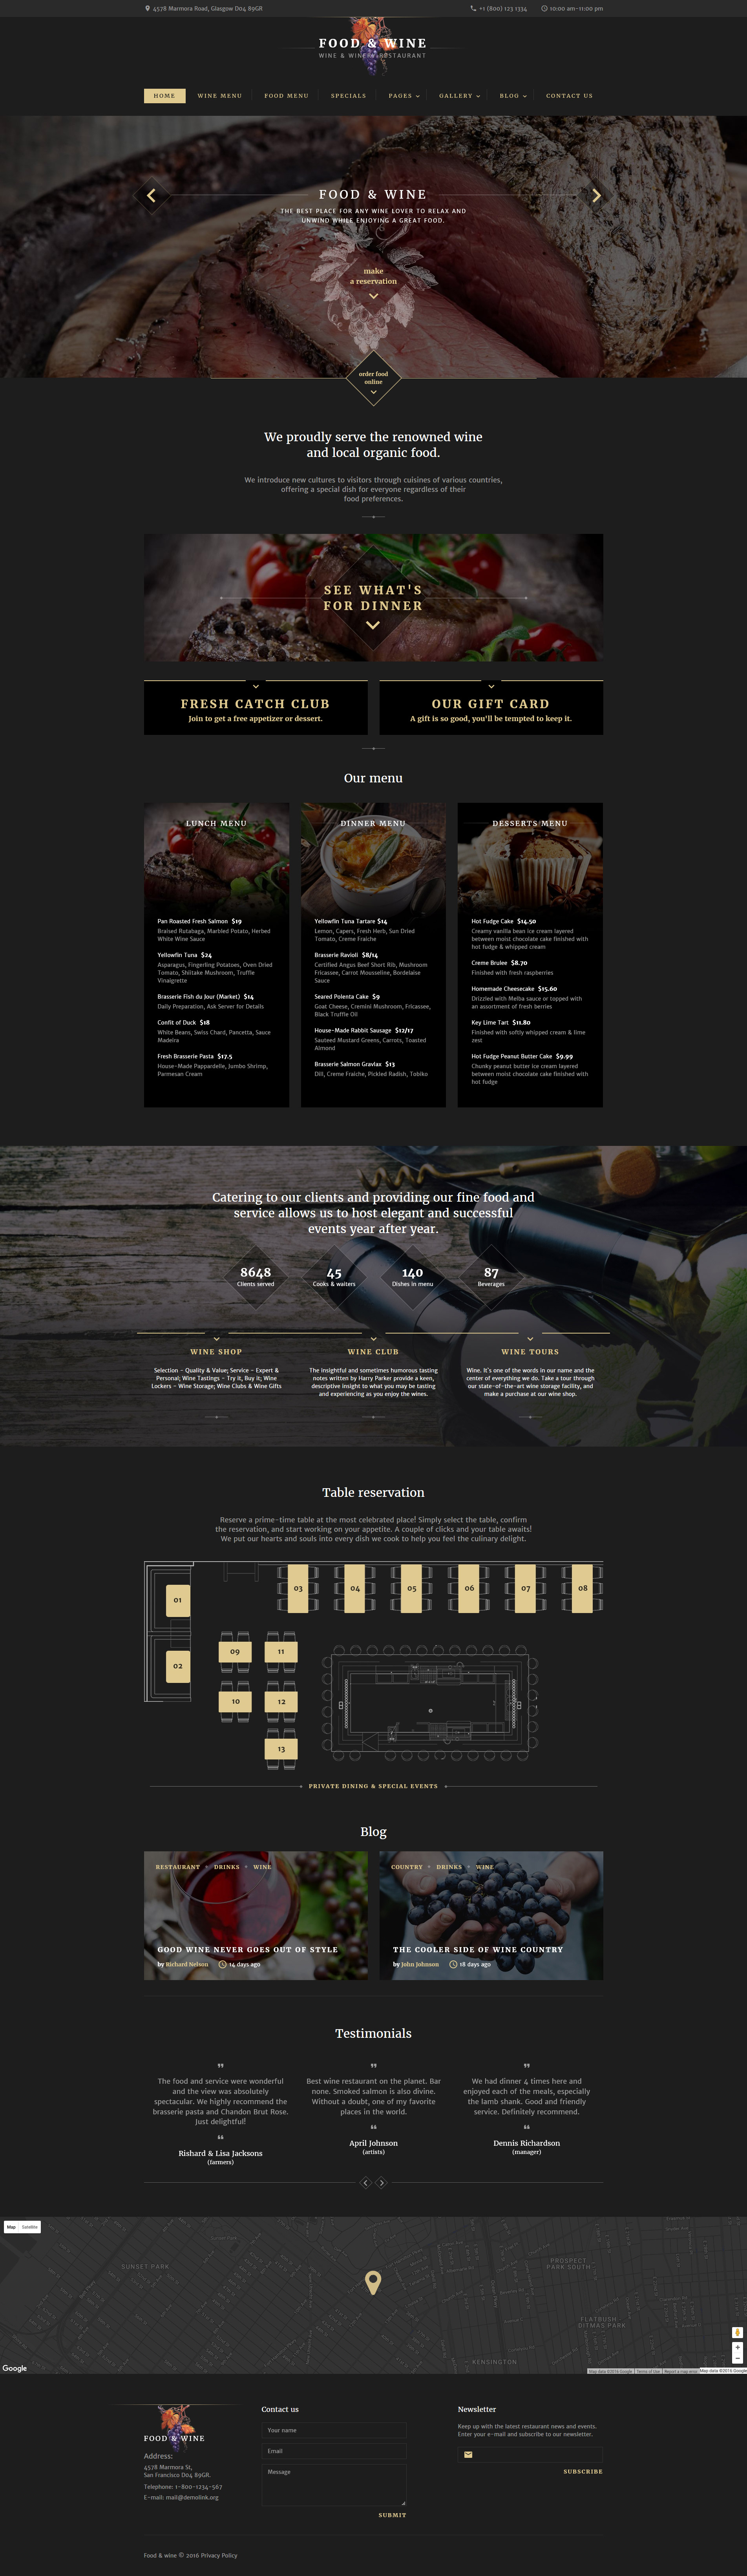 "Plantilla Web ""Food  Wine"" #60038 - captura de pantalla"